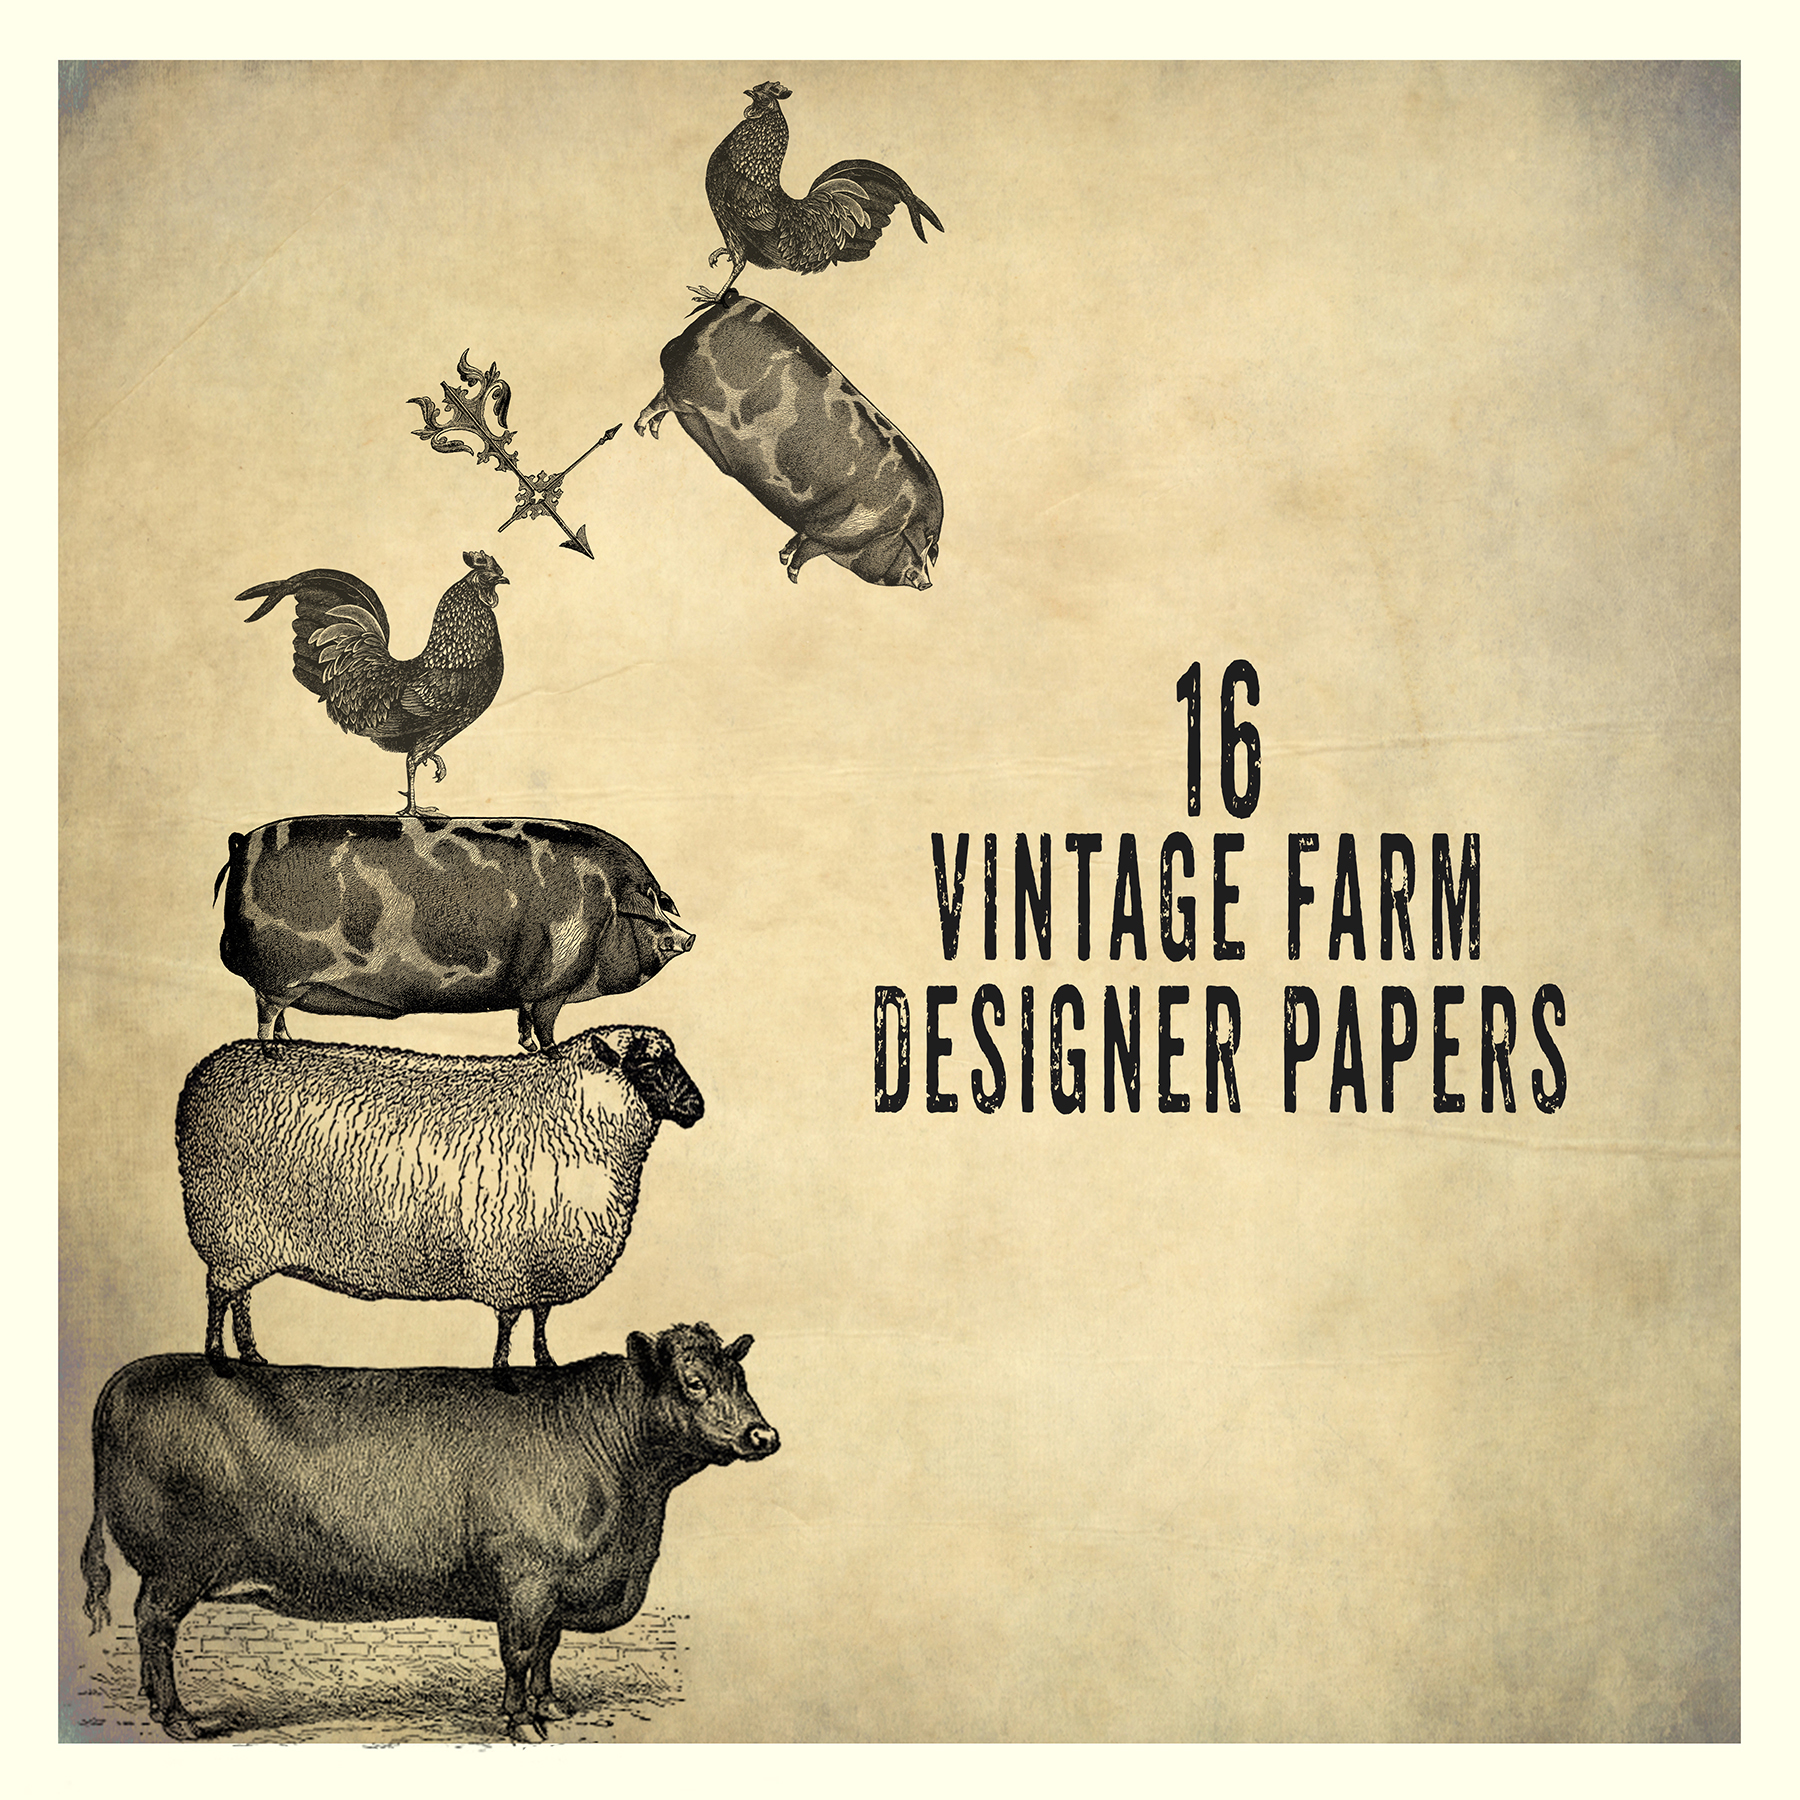 Vintage Farmers Market Sign Vintage Farm Backgroun...